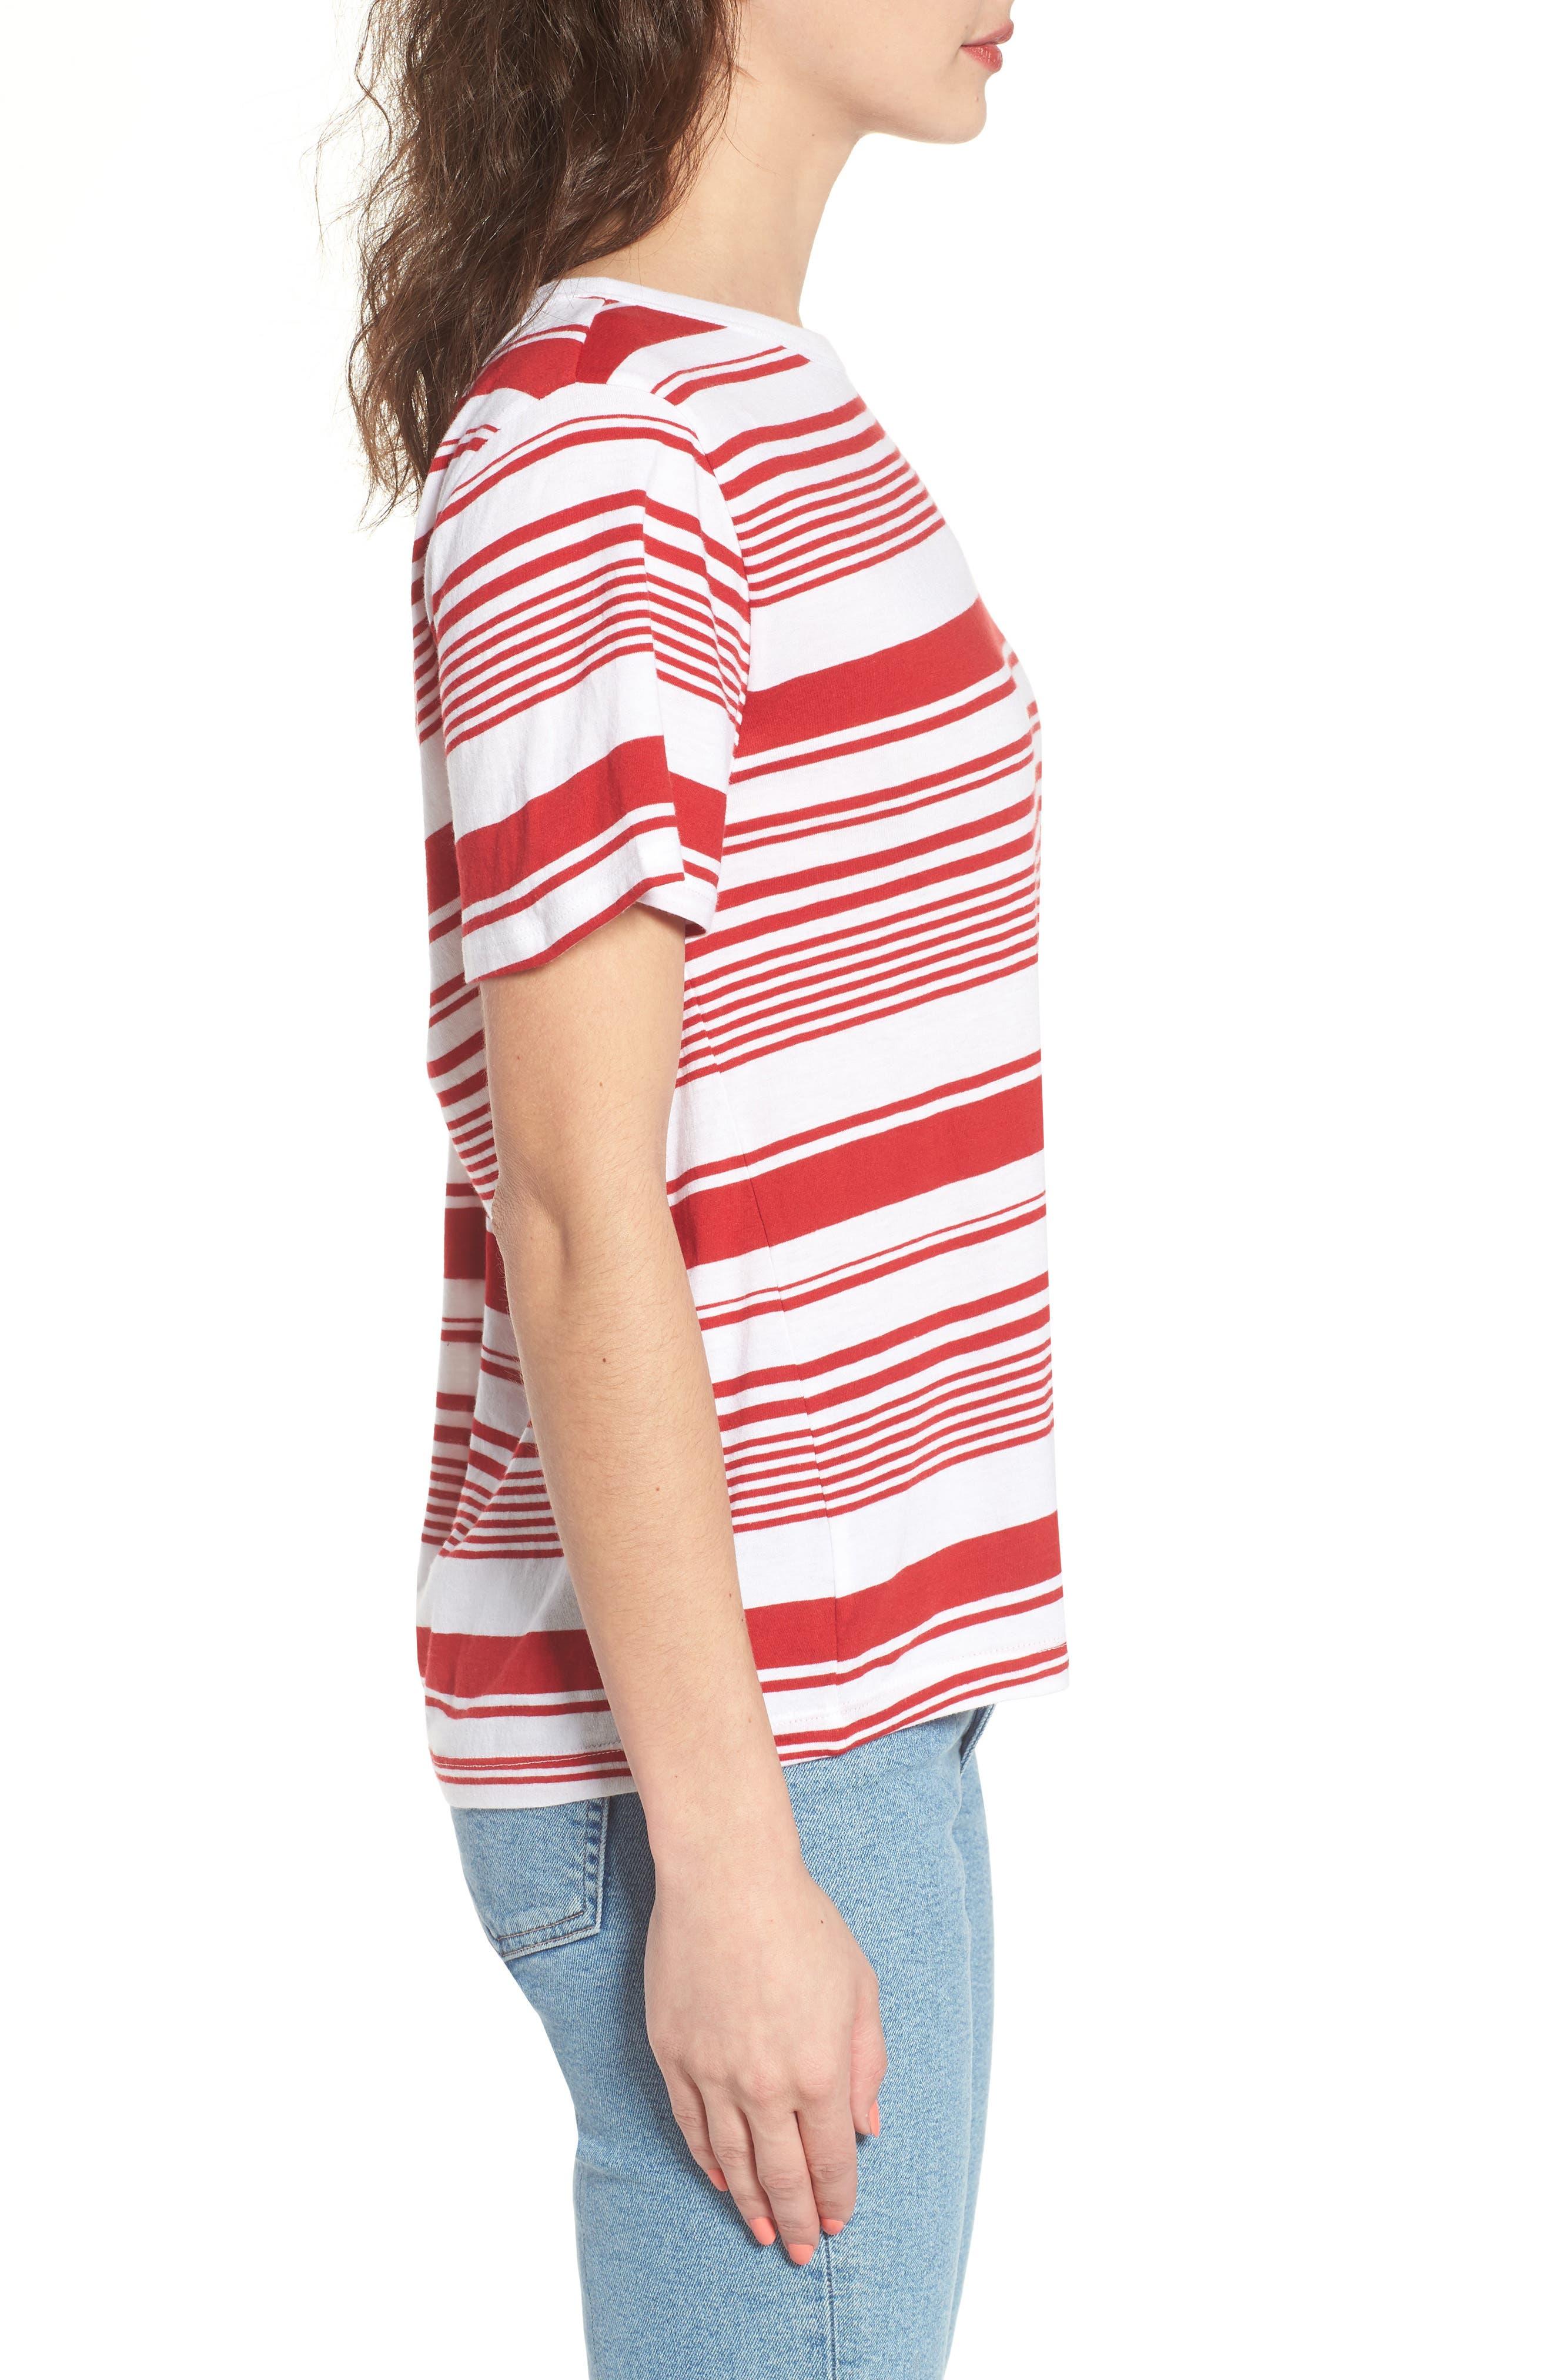 Twist Back Tee,                             Alternate thumbnail 3, color,                             Red Couture Monaco Stripe